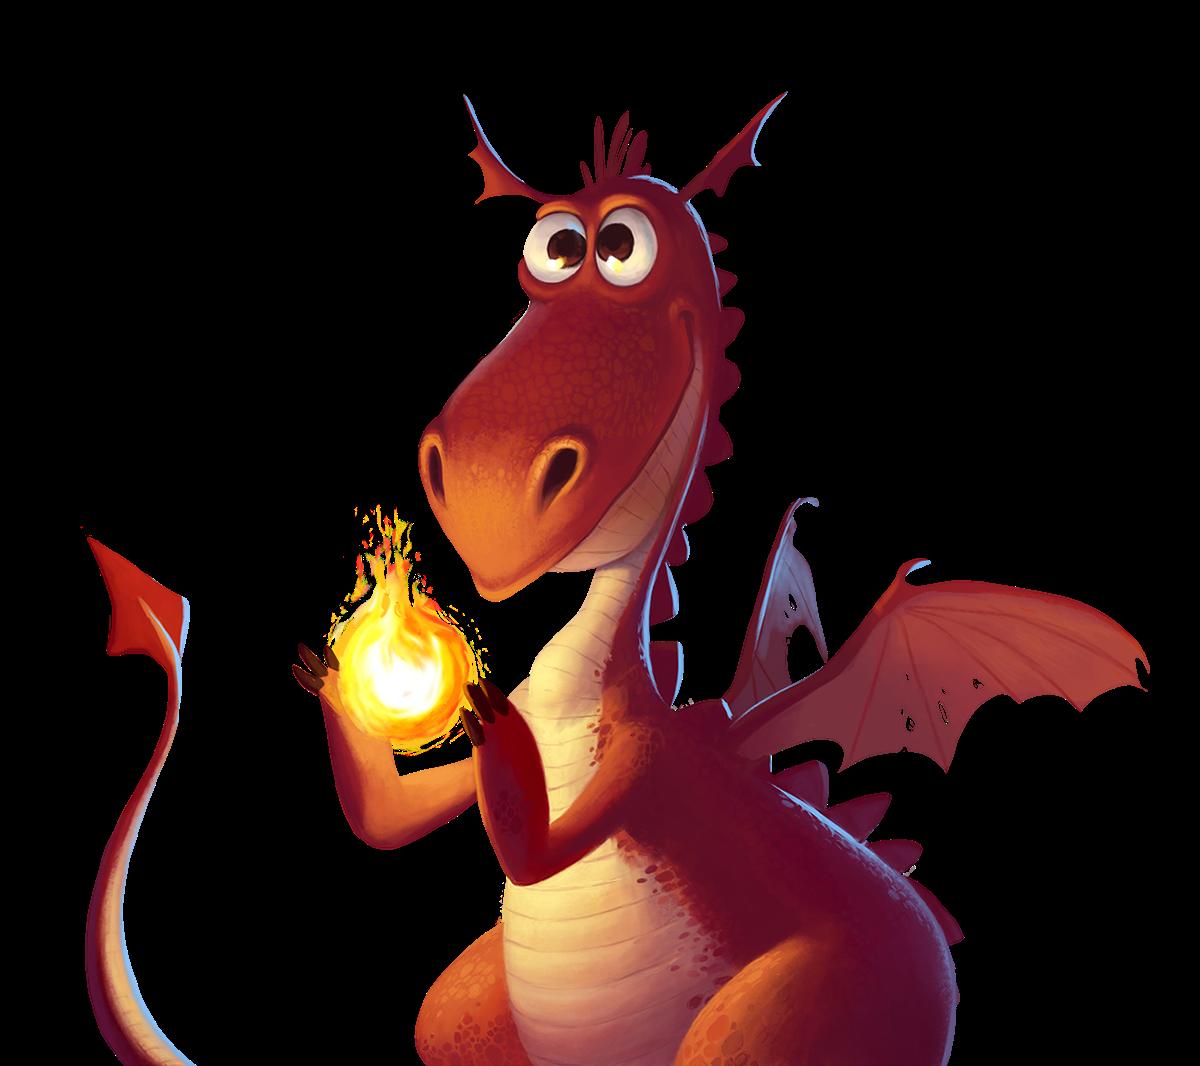 B1938a222c20f3e2f6b389da9a378804 Png 1200 1066 Cartoon Dragon Cute Dragon Drawing Cute Dragons